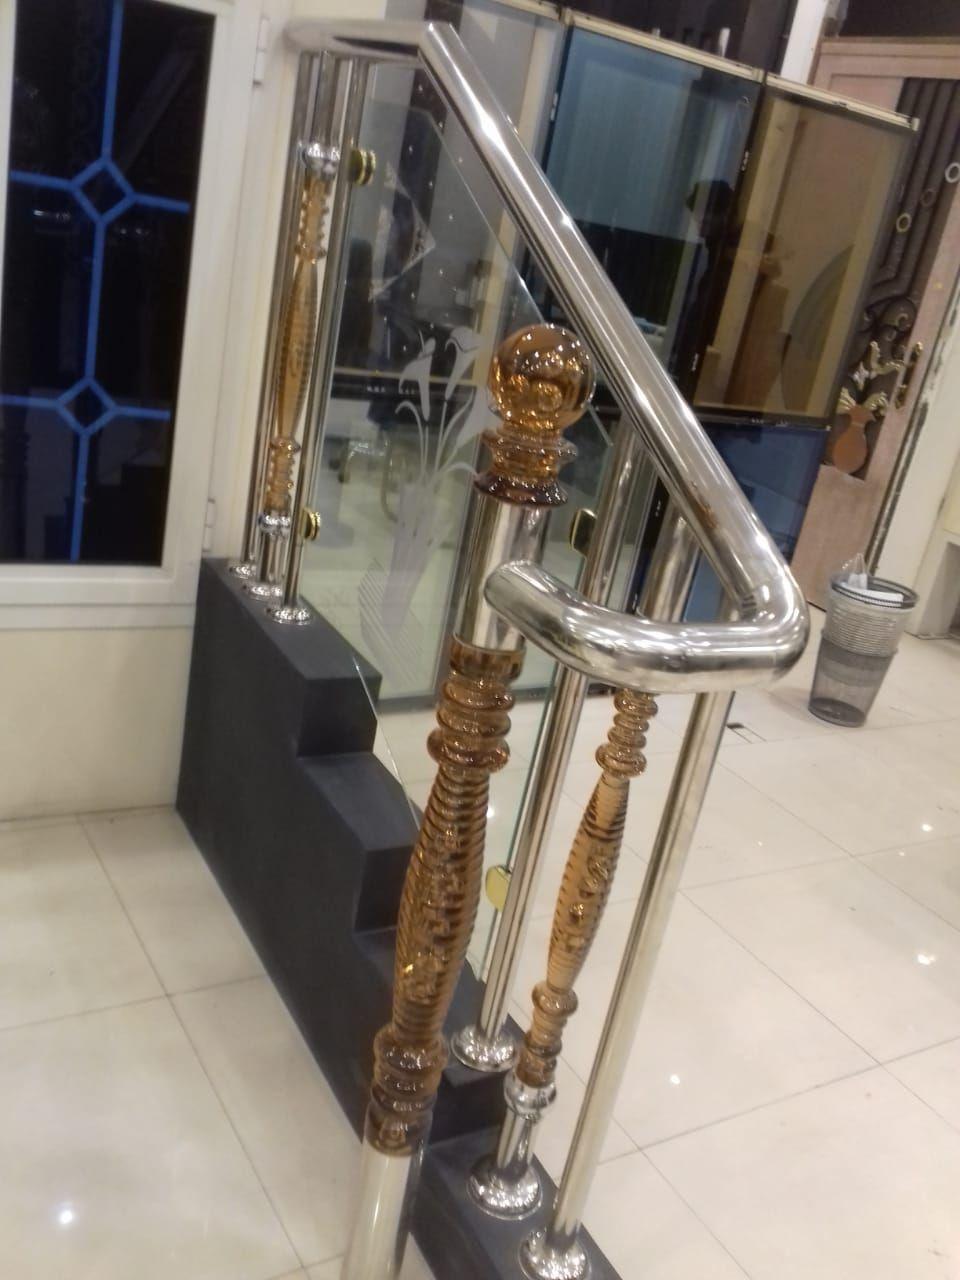 Pin By Tent Ksa On مقاولات عامة الرياض 0530608113 Home Appliances Dyson Vacuum Vacuum Cleaner